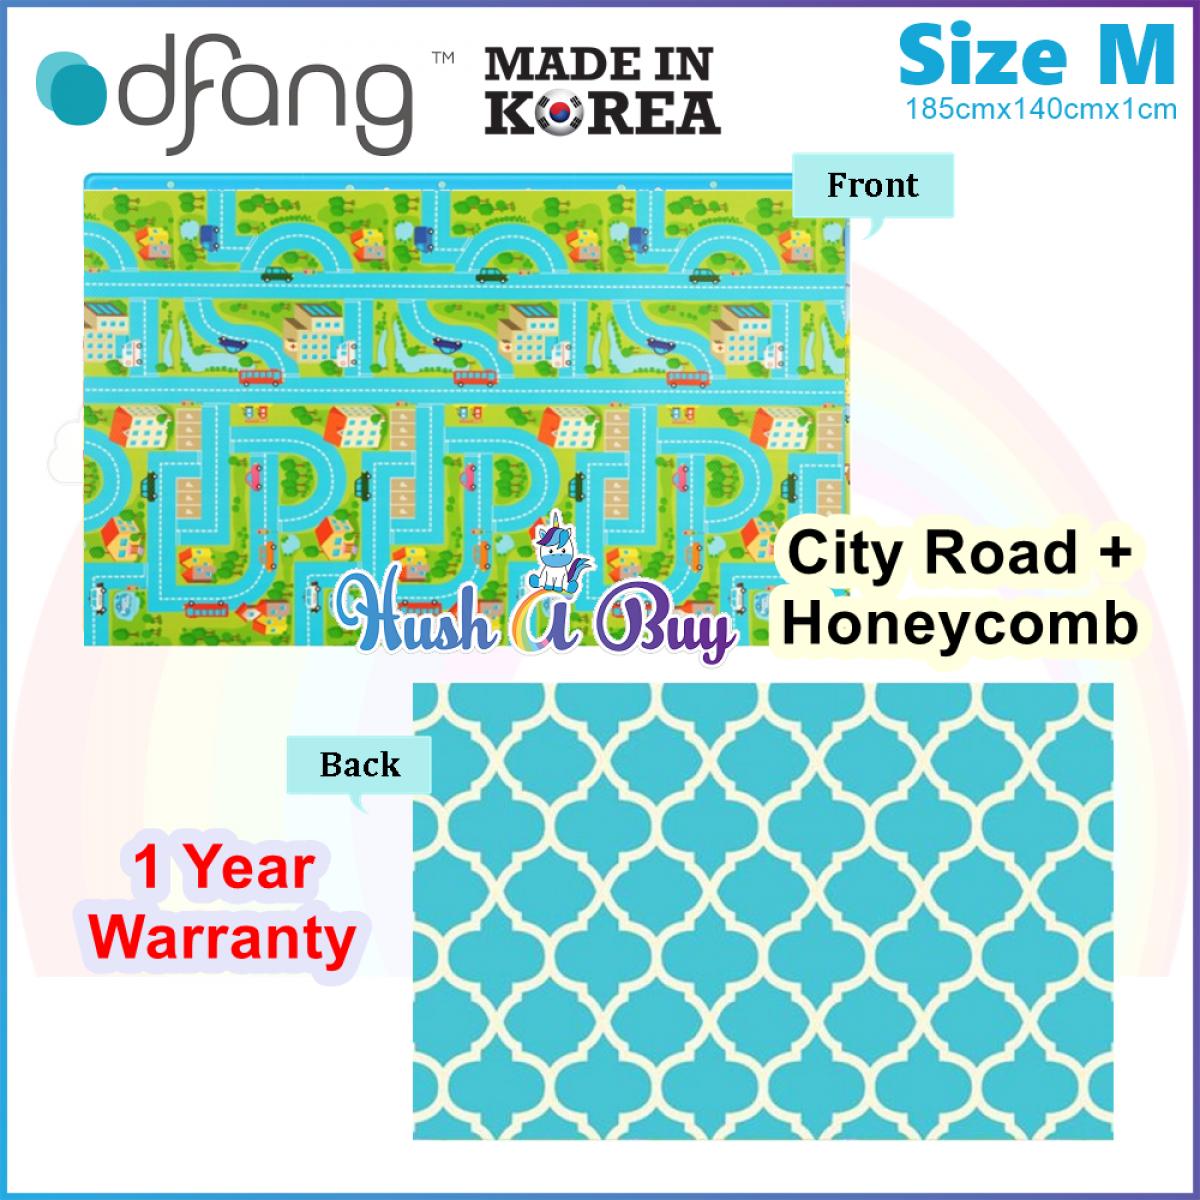 Dfang Double Film Premium PVC Mat (185x140x1.0cm) Size M - Made in Korea (1 Year Warranty)